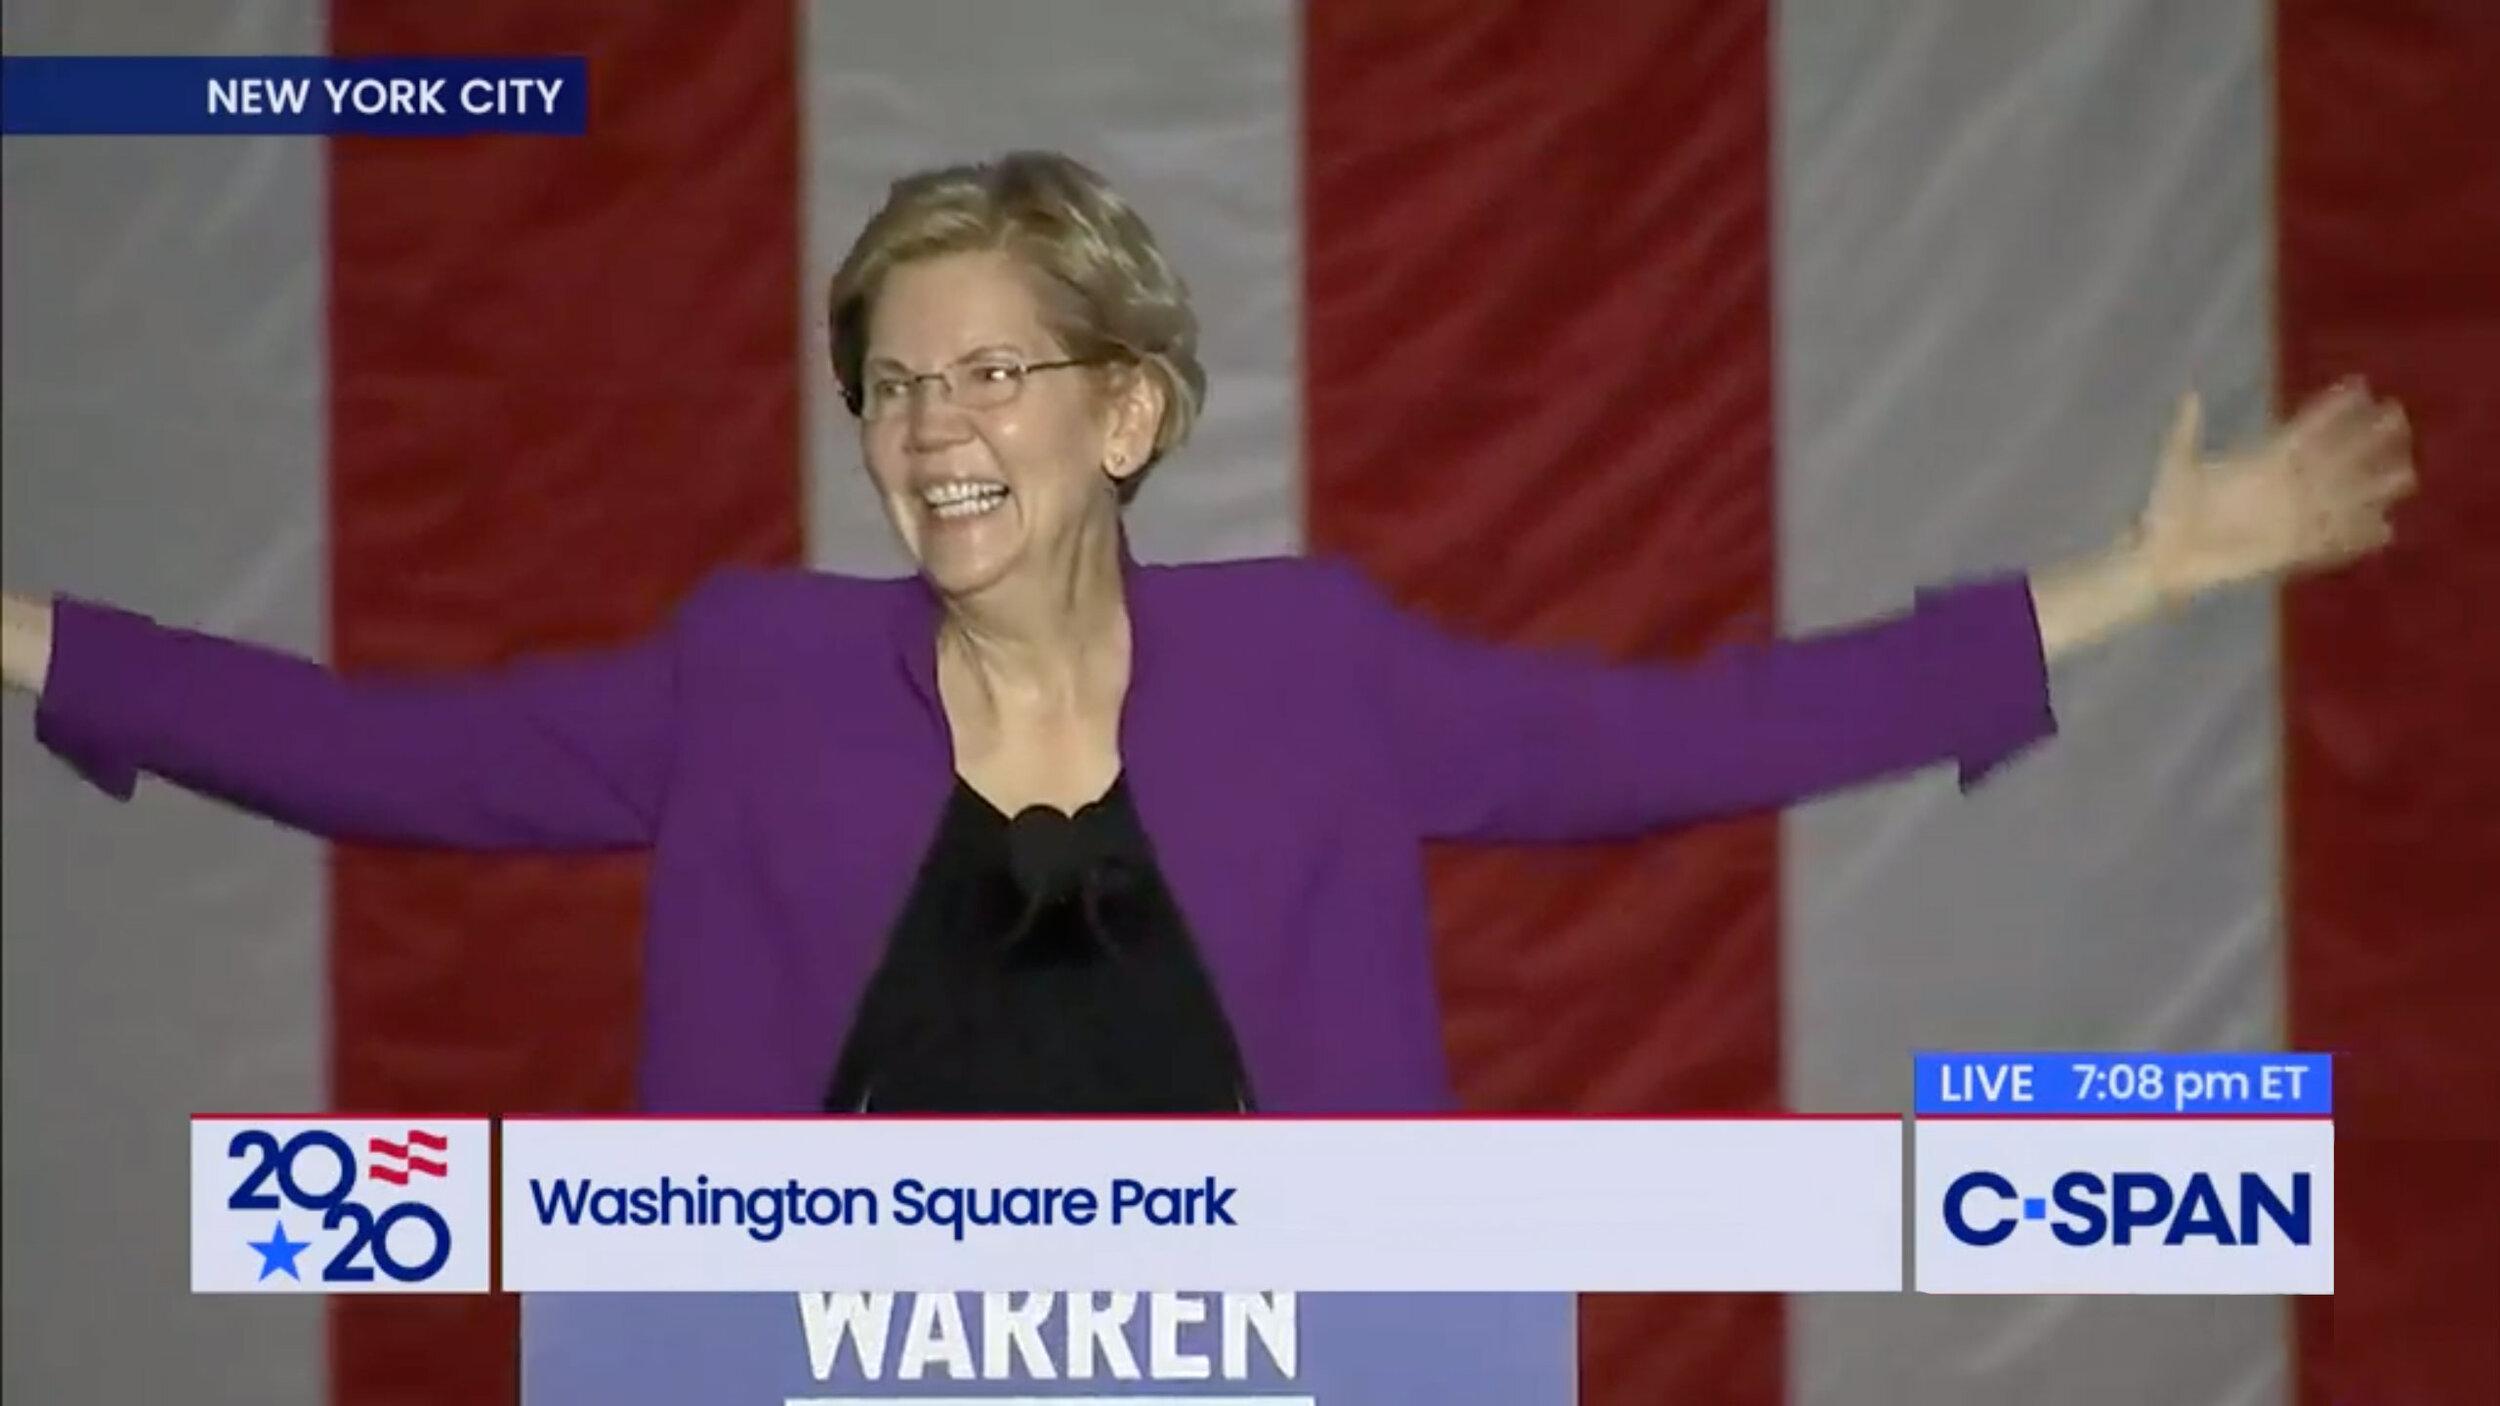 Screenshot from  C-SPAN : Senator Elizabeth Warren Speech in Washington Square Park